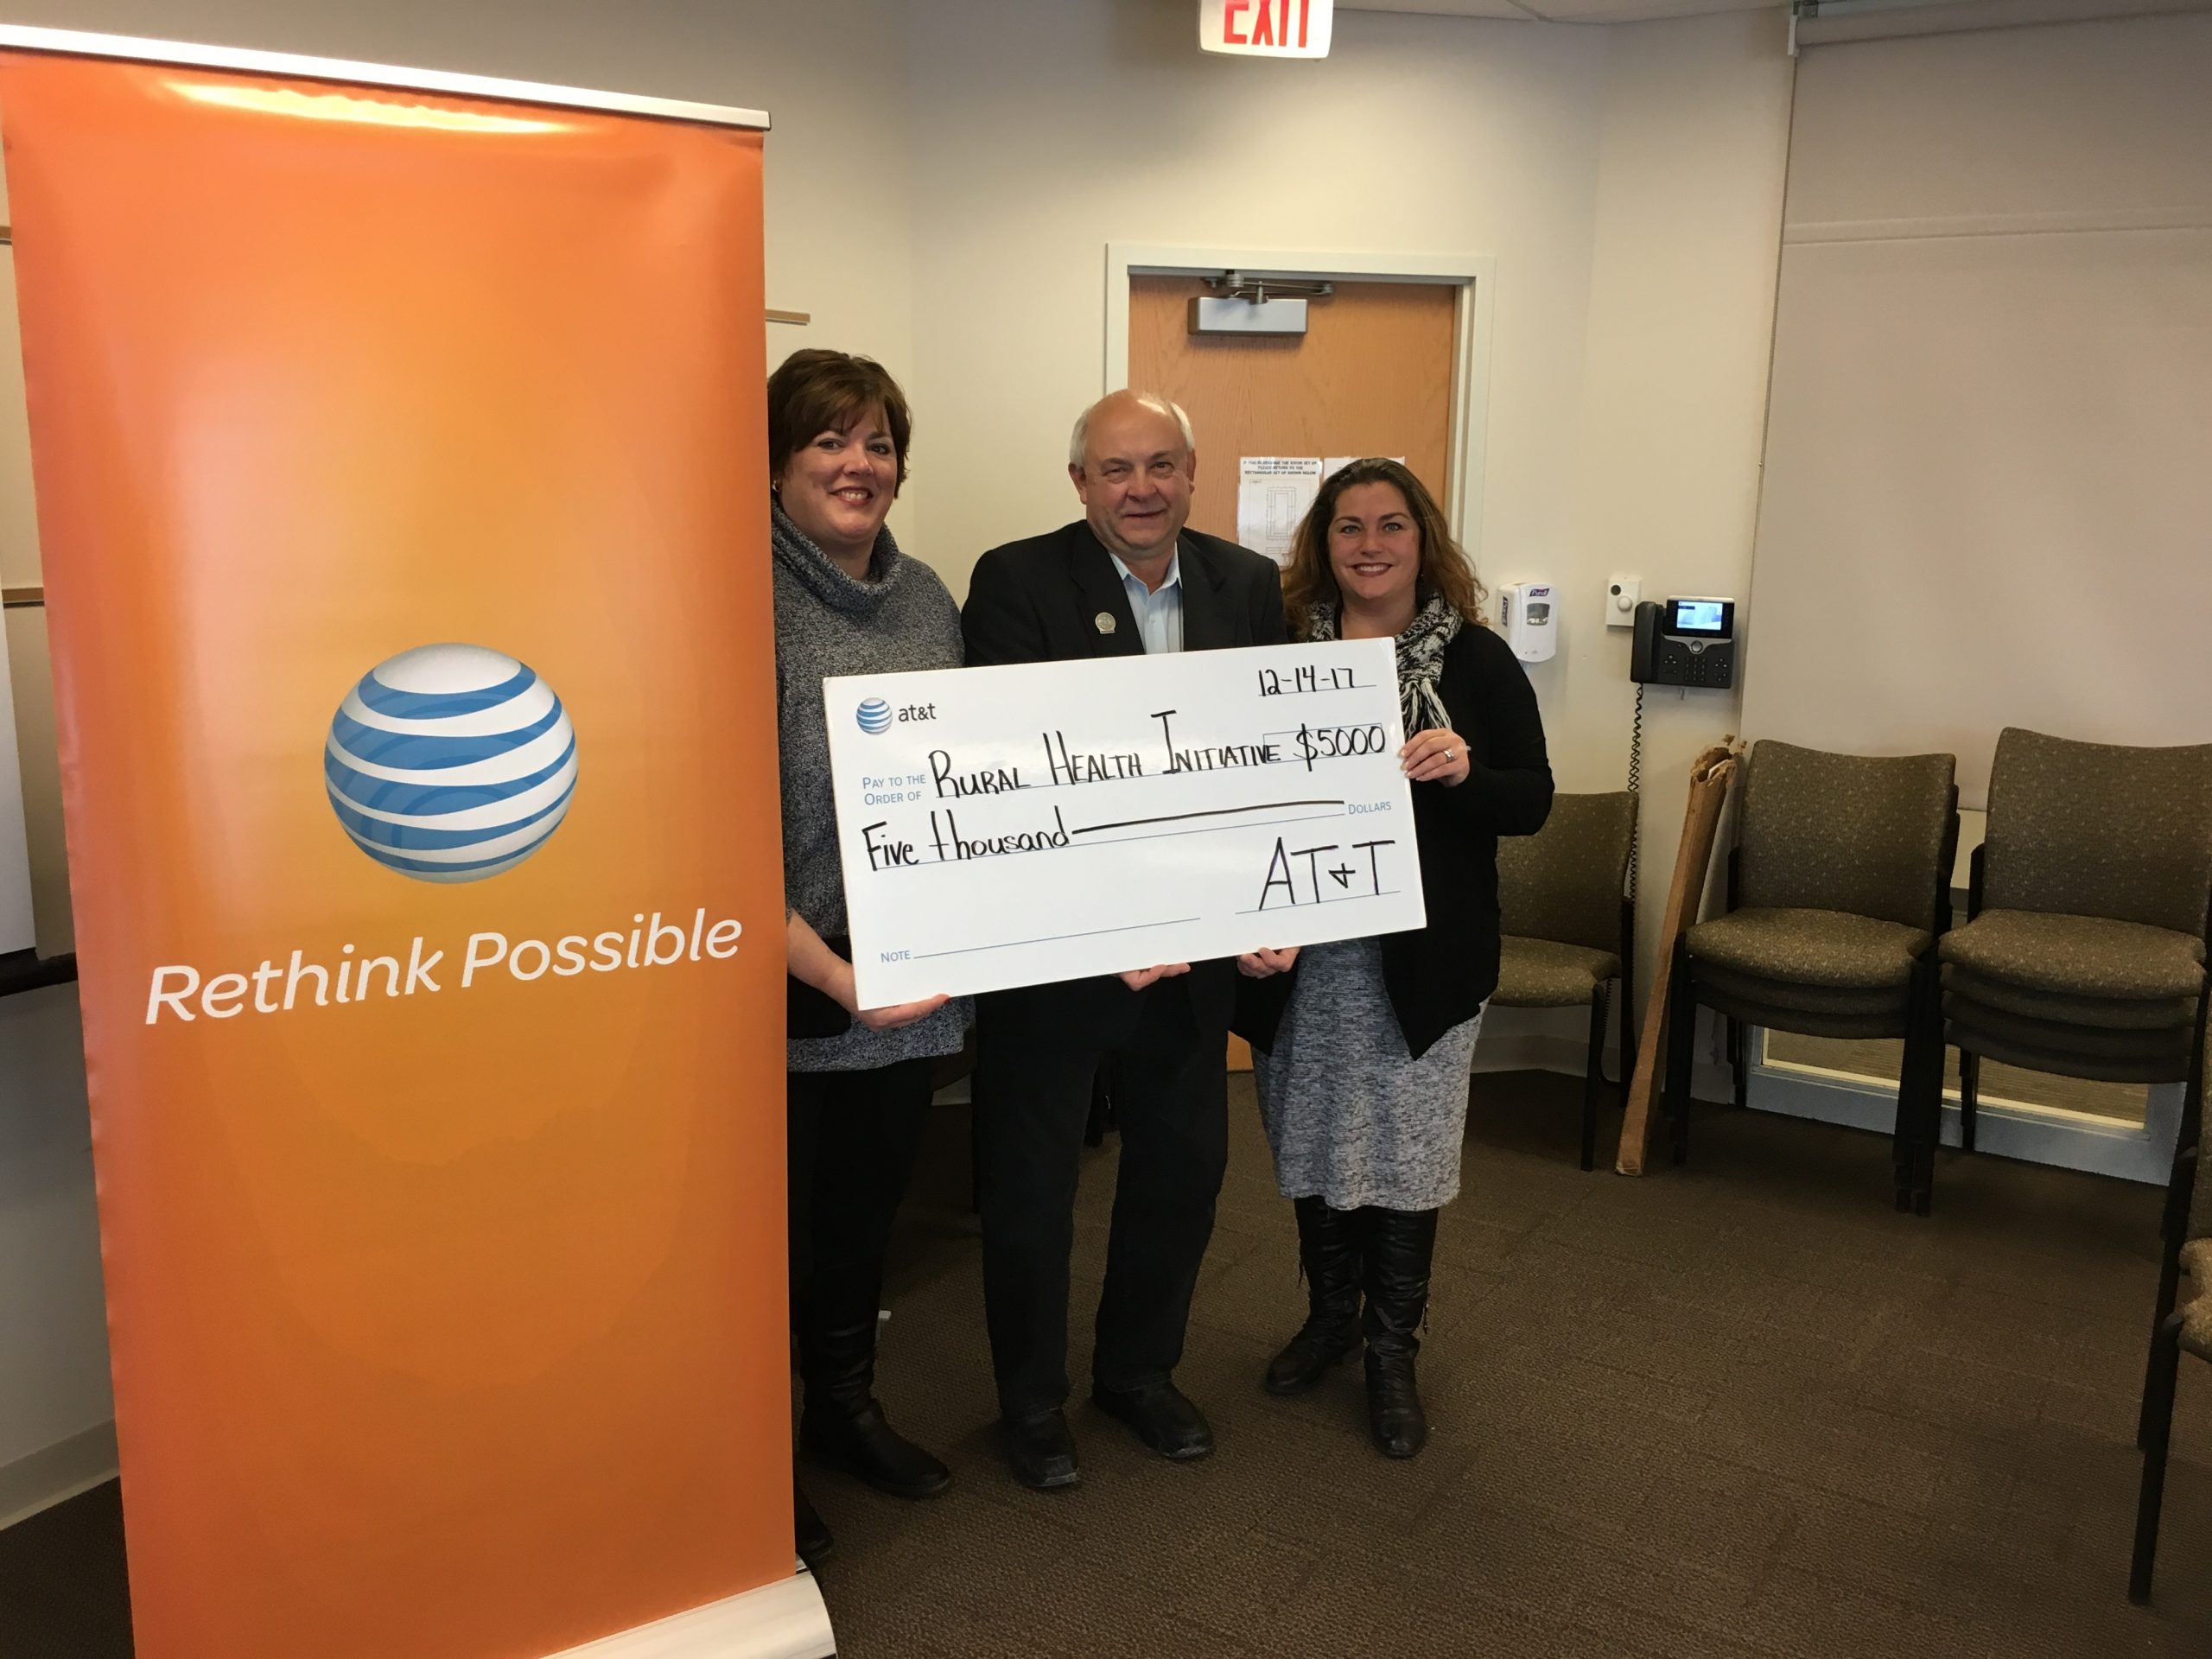 Rural Health Initiative gets $5,000 grant